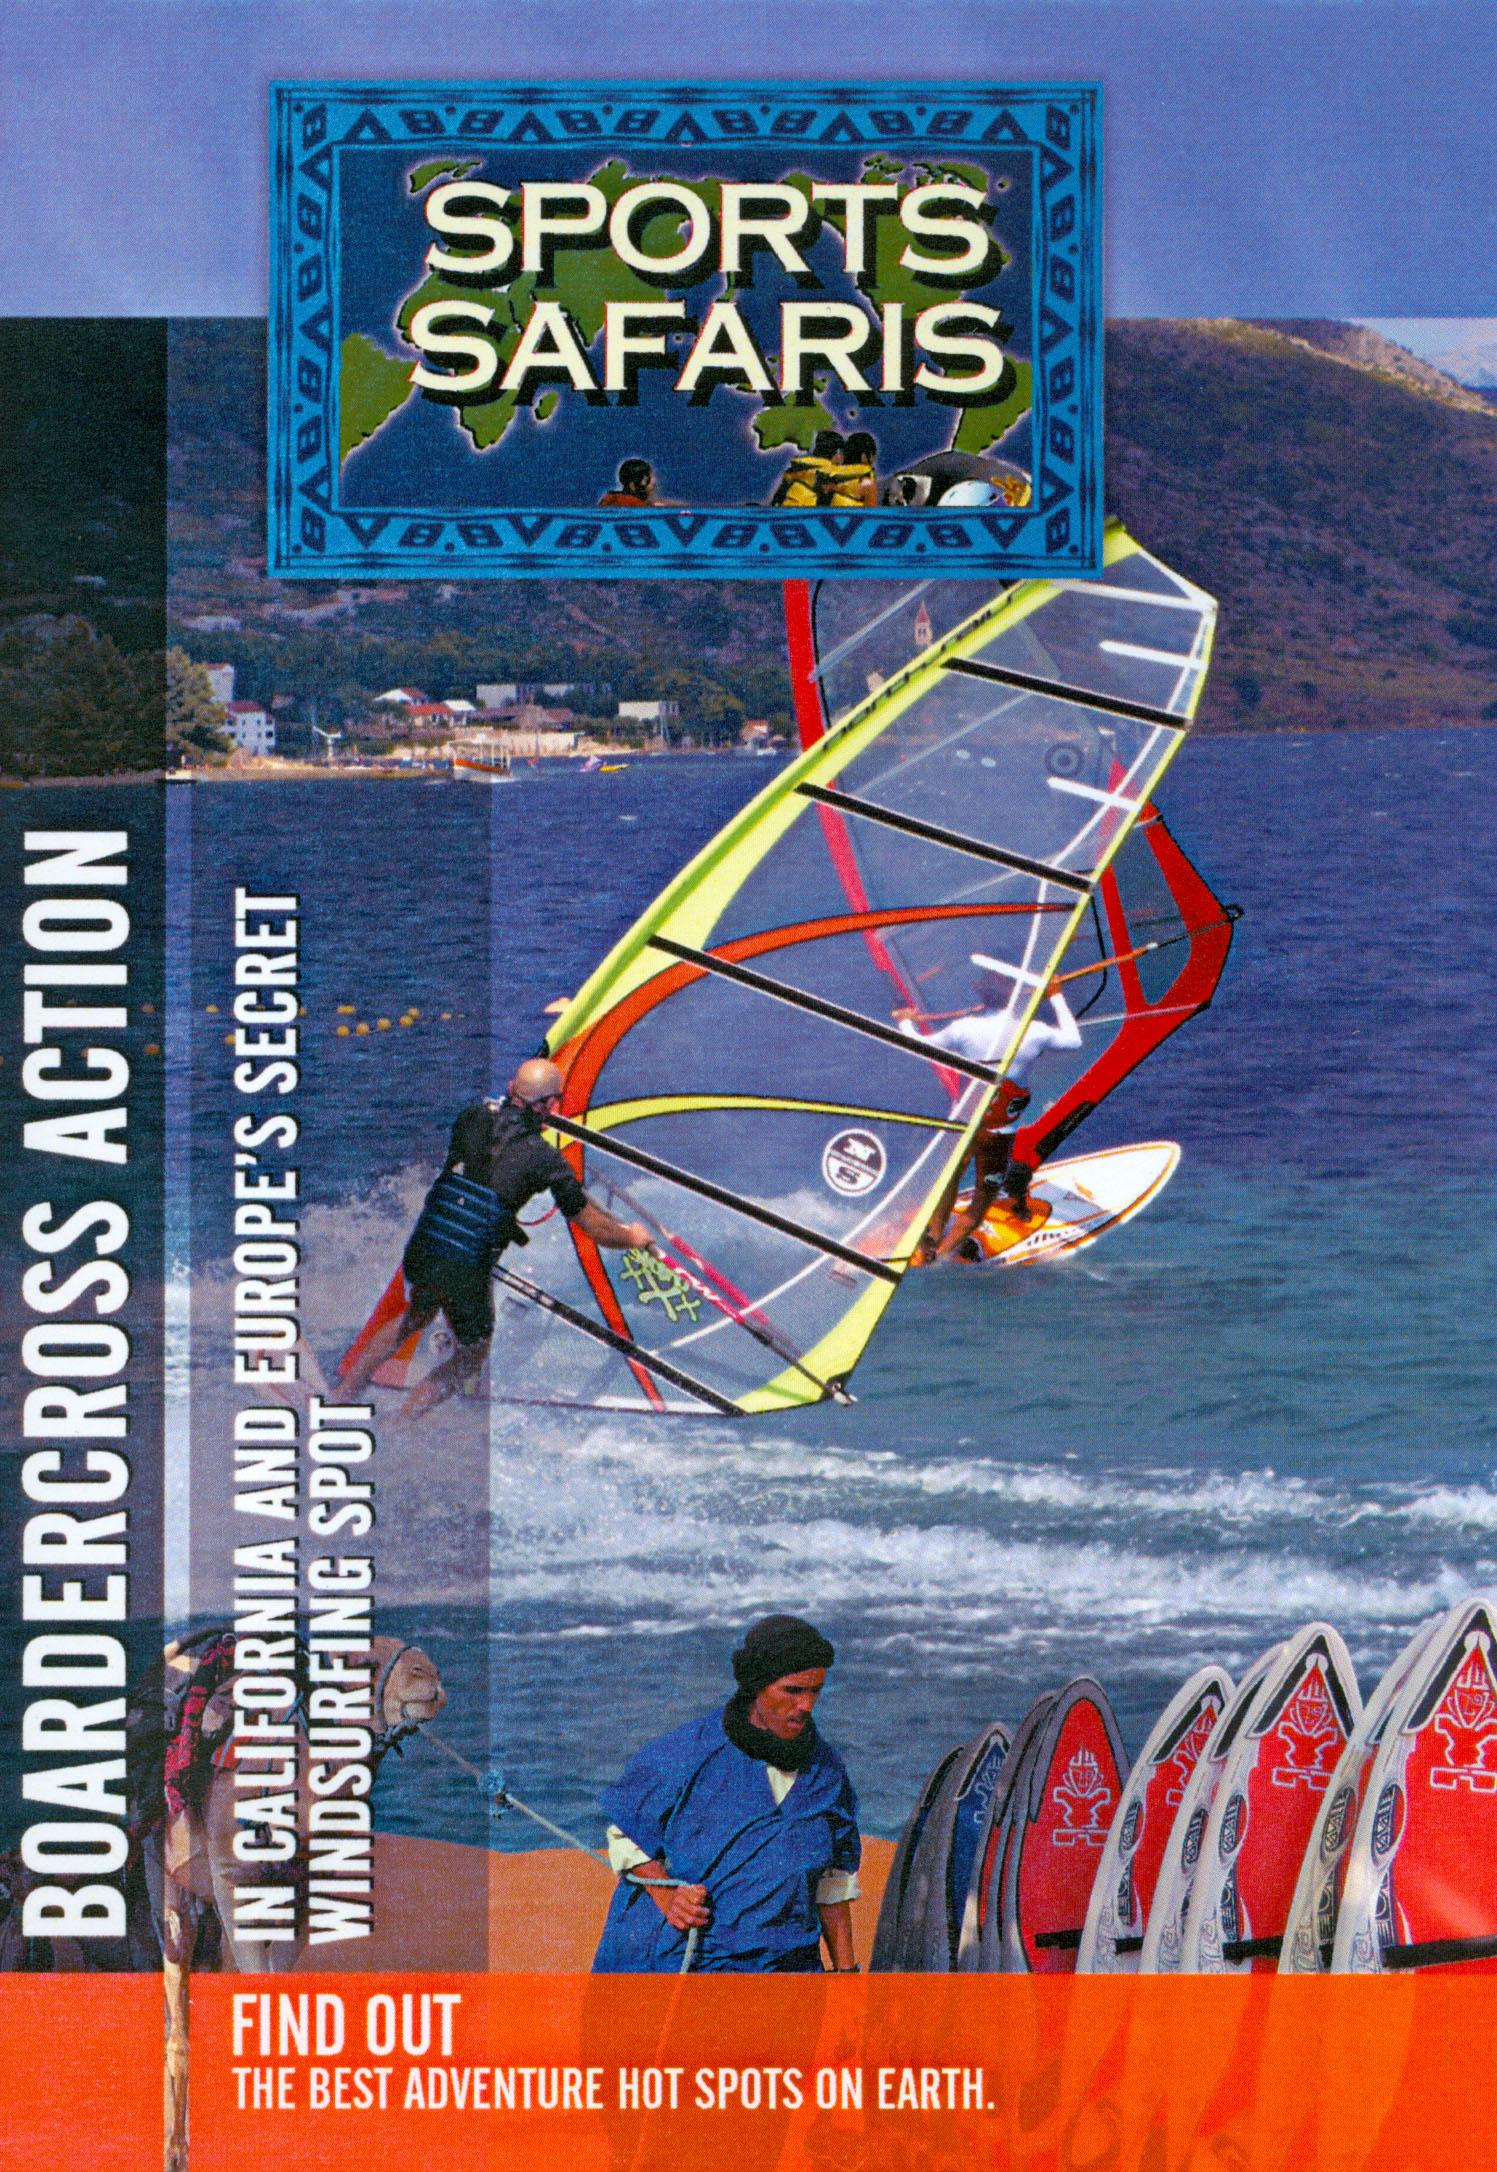 Sports Safaris: Boardercross Action